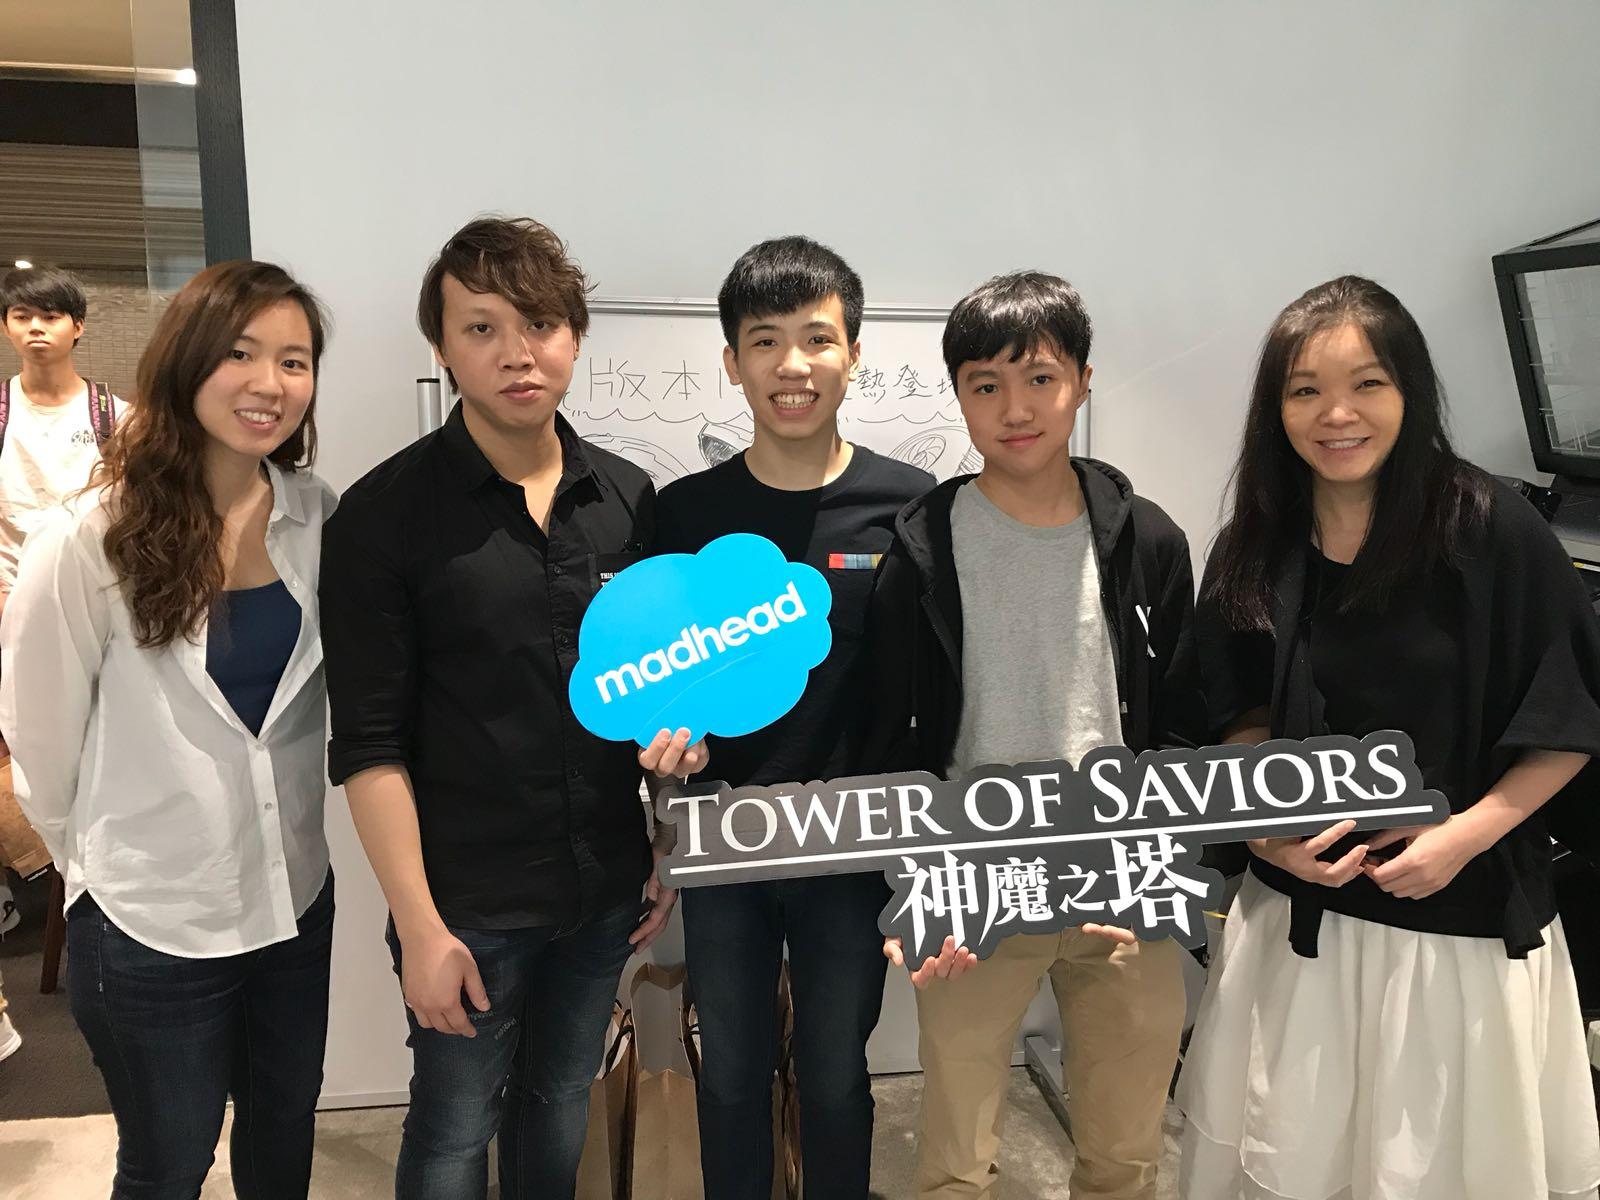 https://www.npc.edu.hk/sites/default/files/s_105521194.jpg